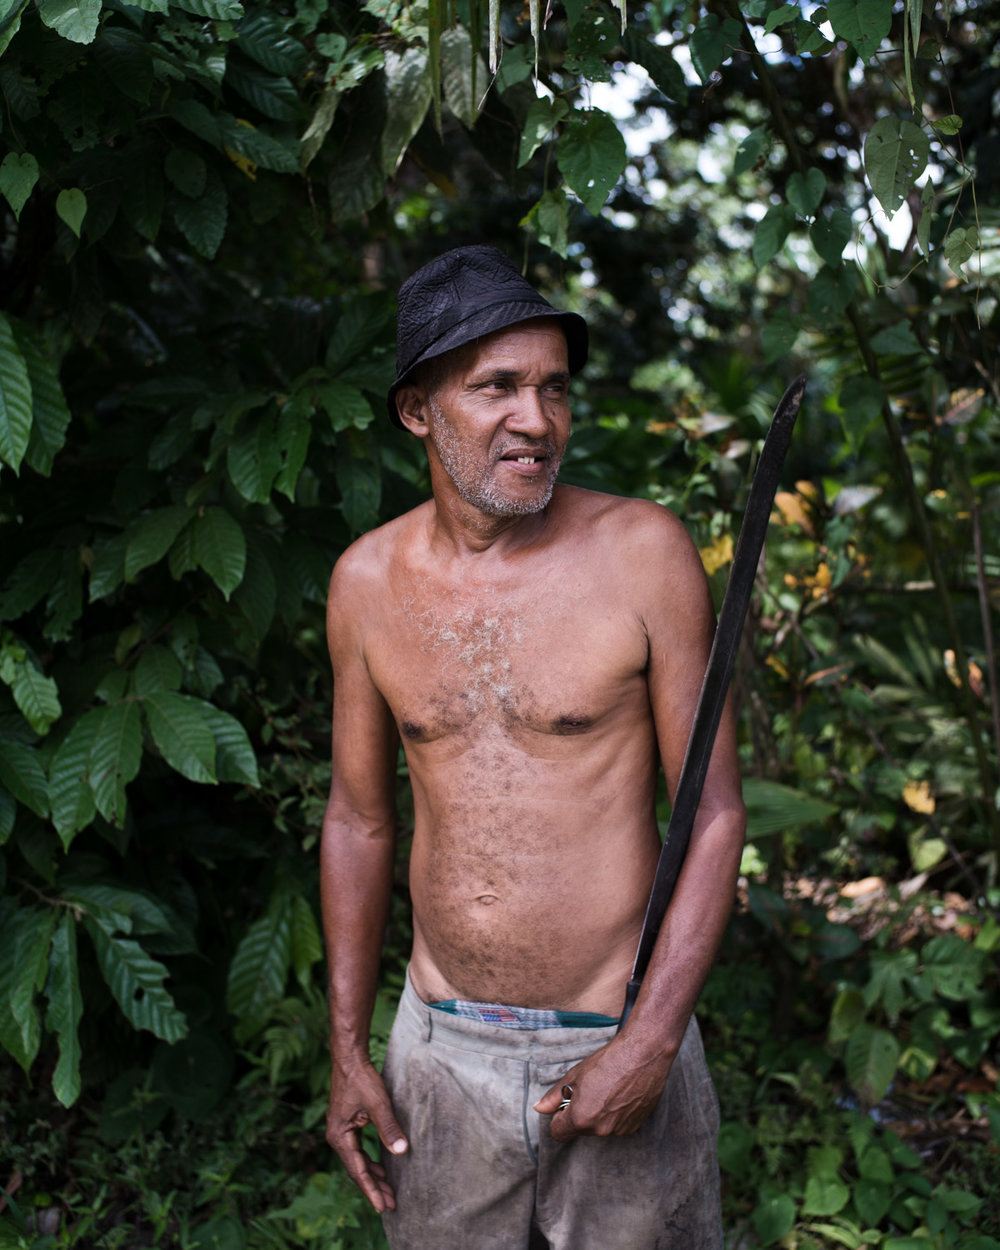 costa-rica-banana-trade-8861.jpg